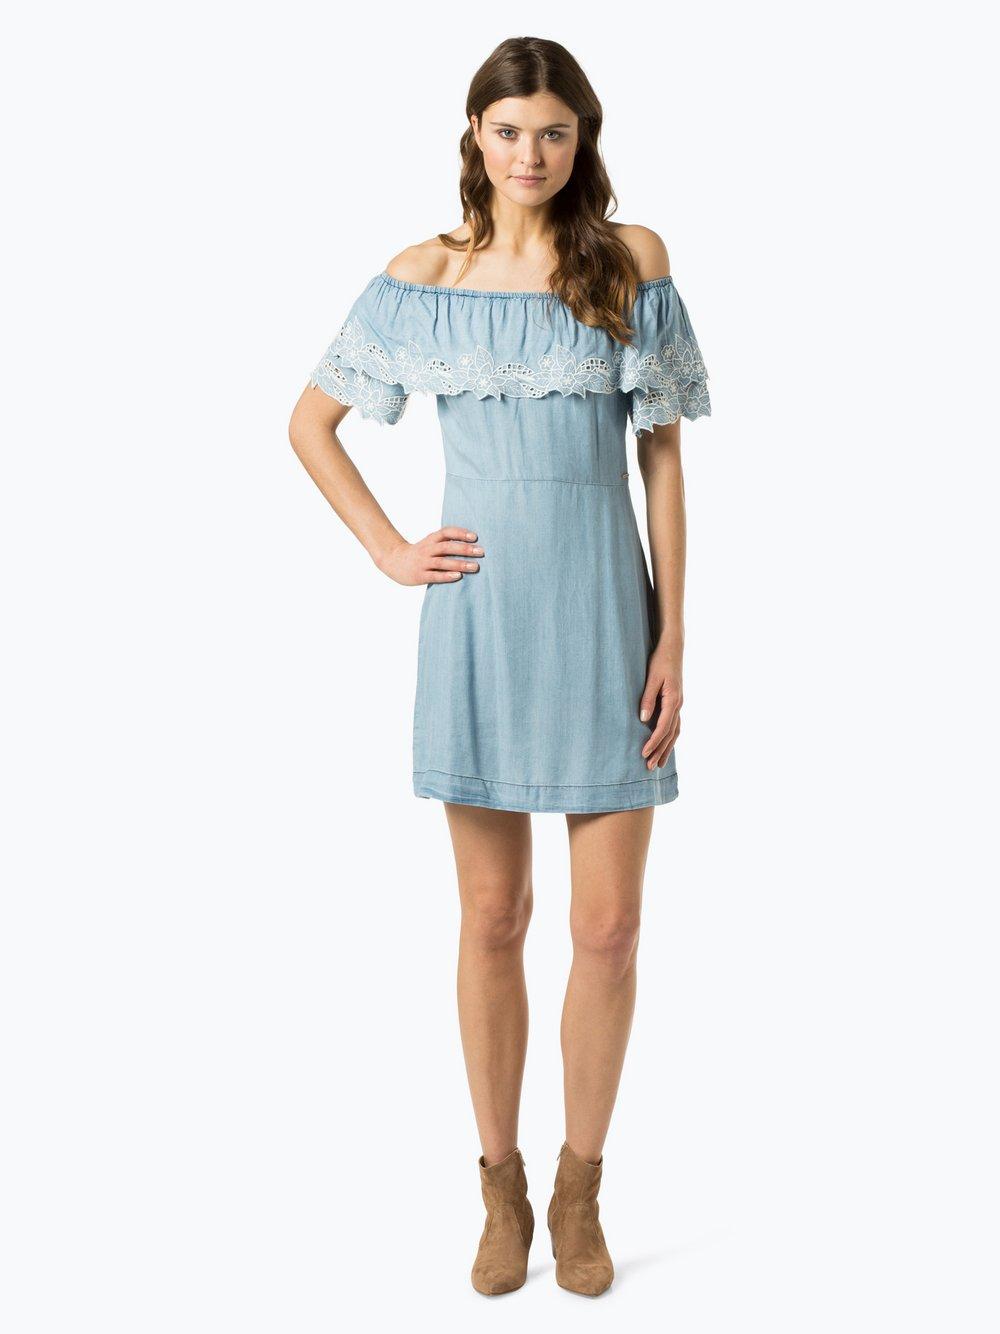 Pepe Jeans - Sukienka damska – Ladies Dress, niebieski